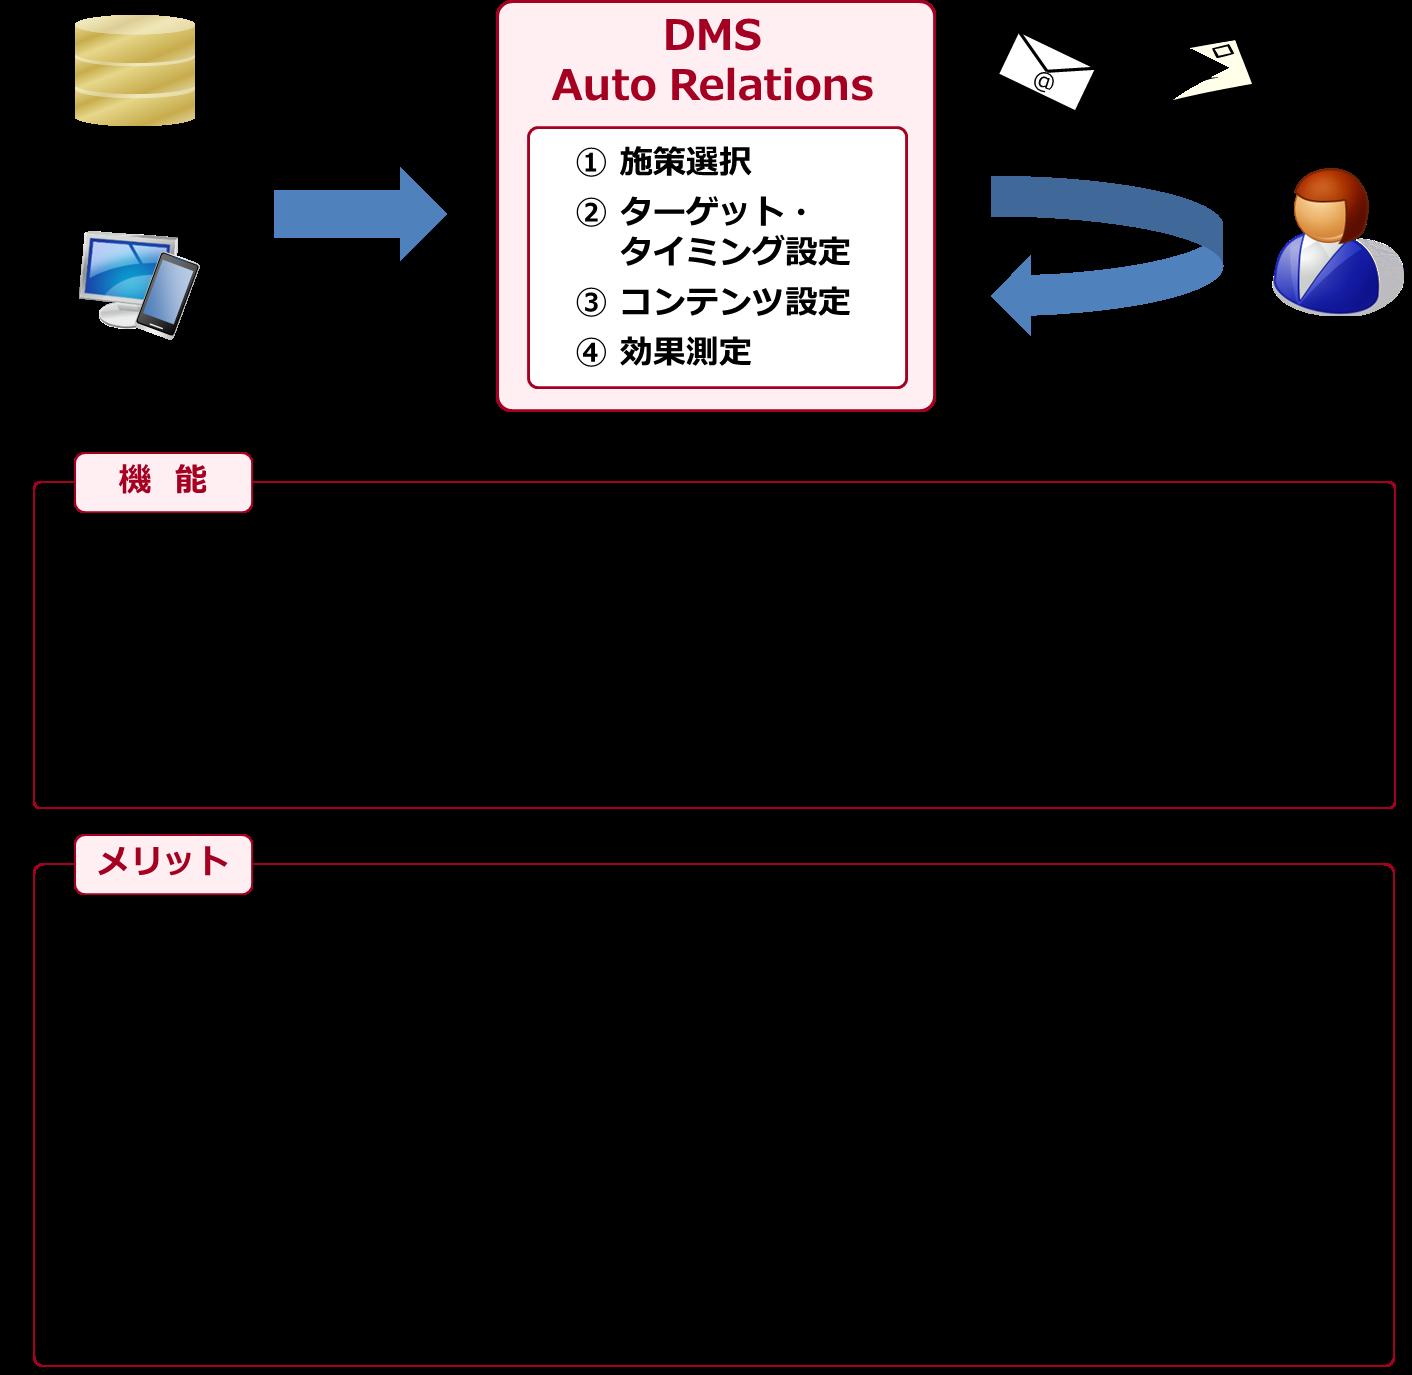 「DMS Auto Relations」システムイメージと機能・メリット